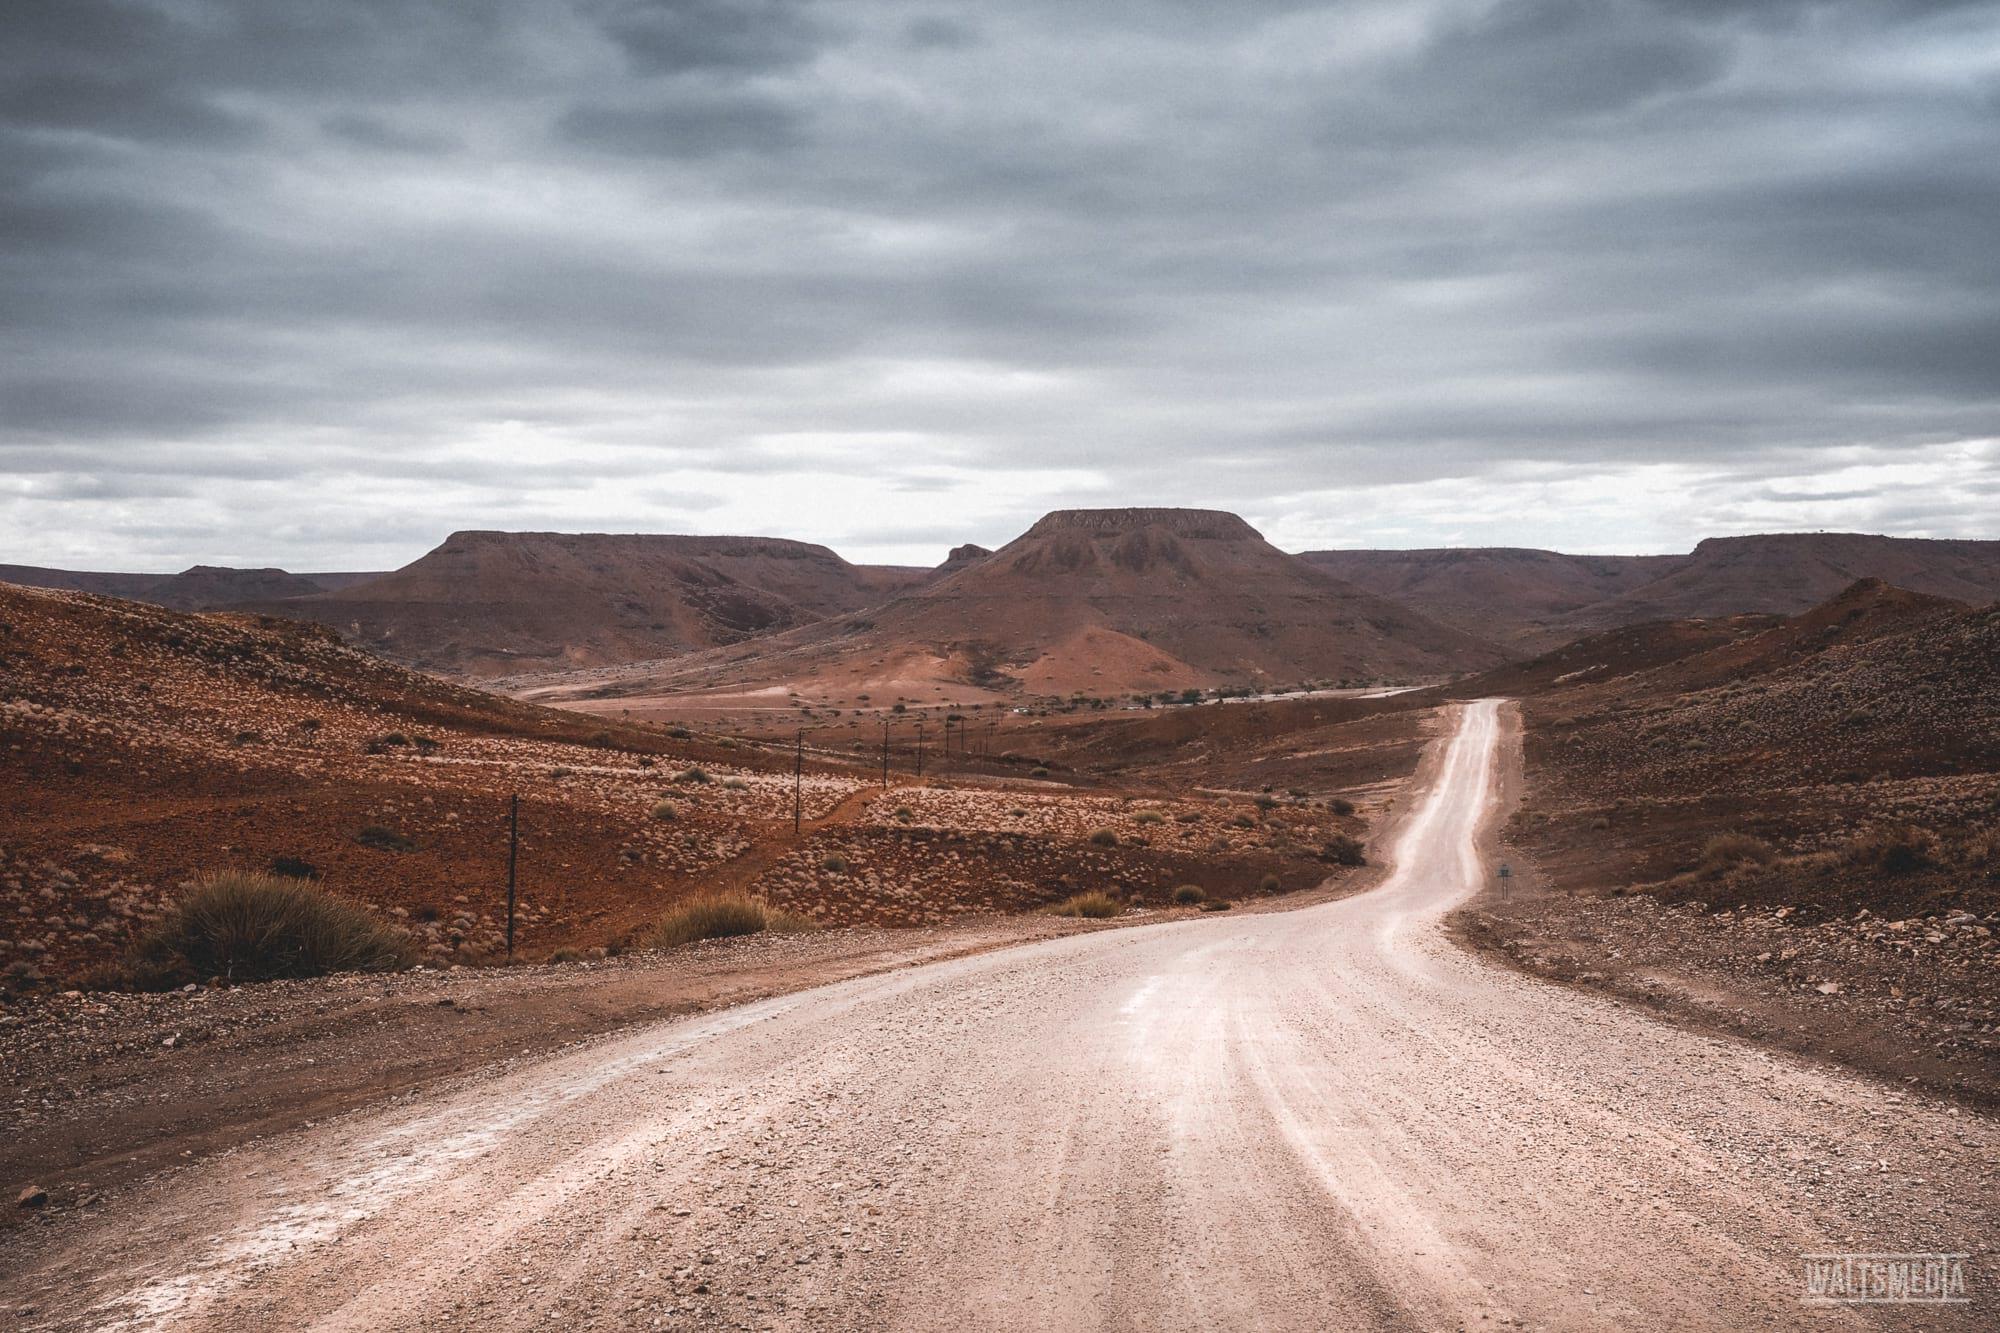 waltsmedia-namibia-travel-portrait-65-38